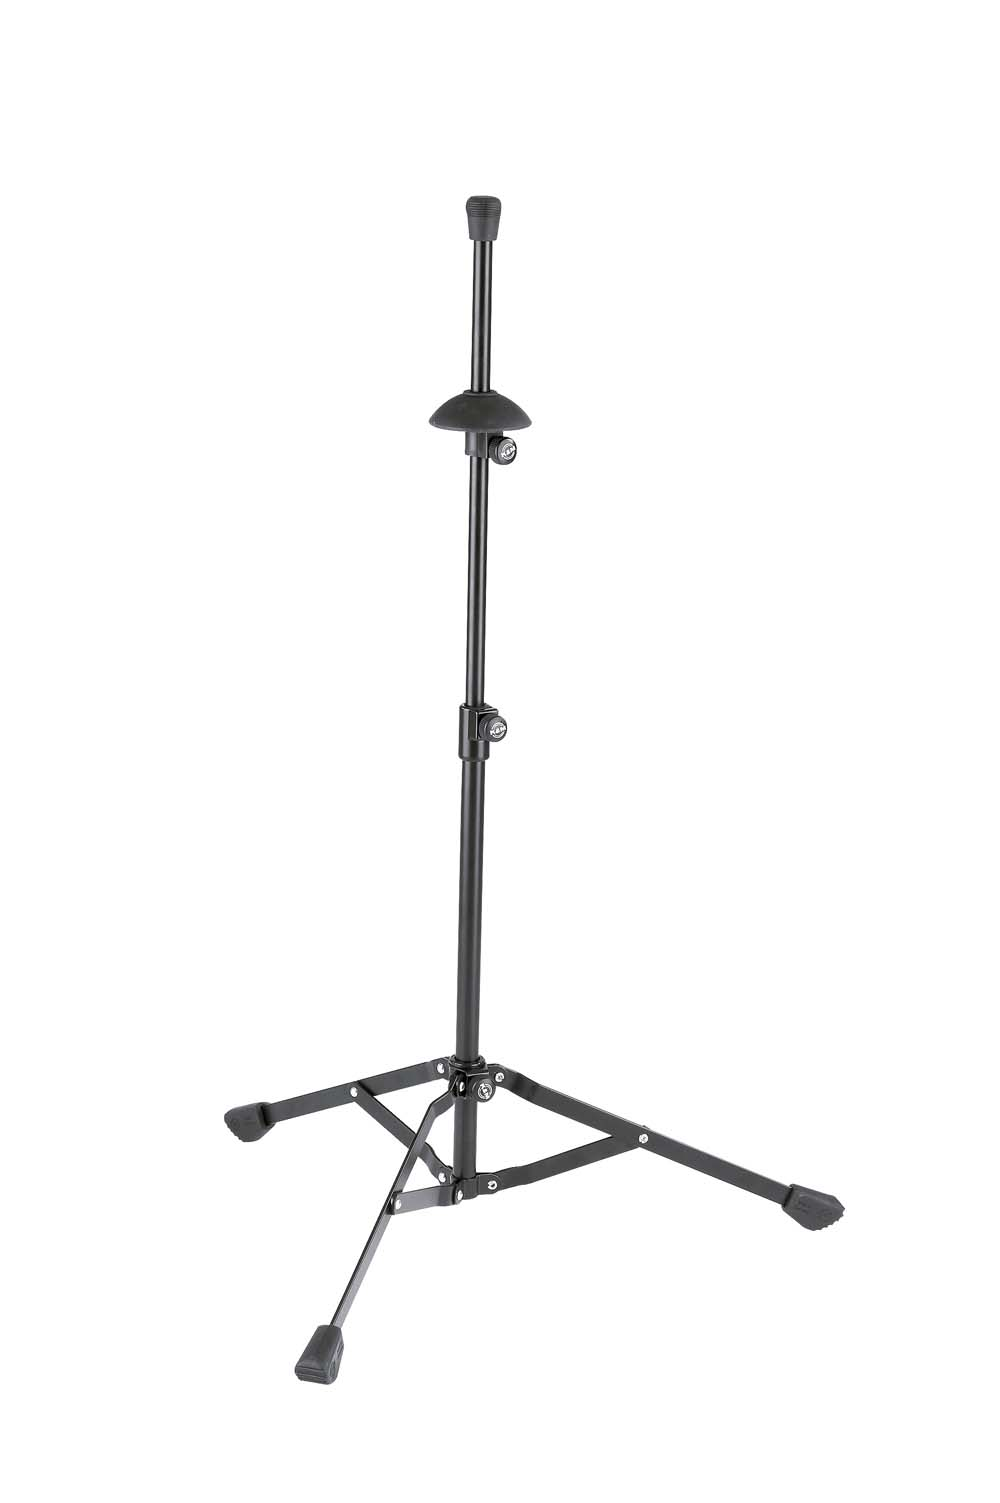 KM 149/9 Trombone stand